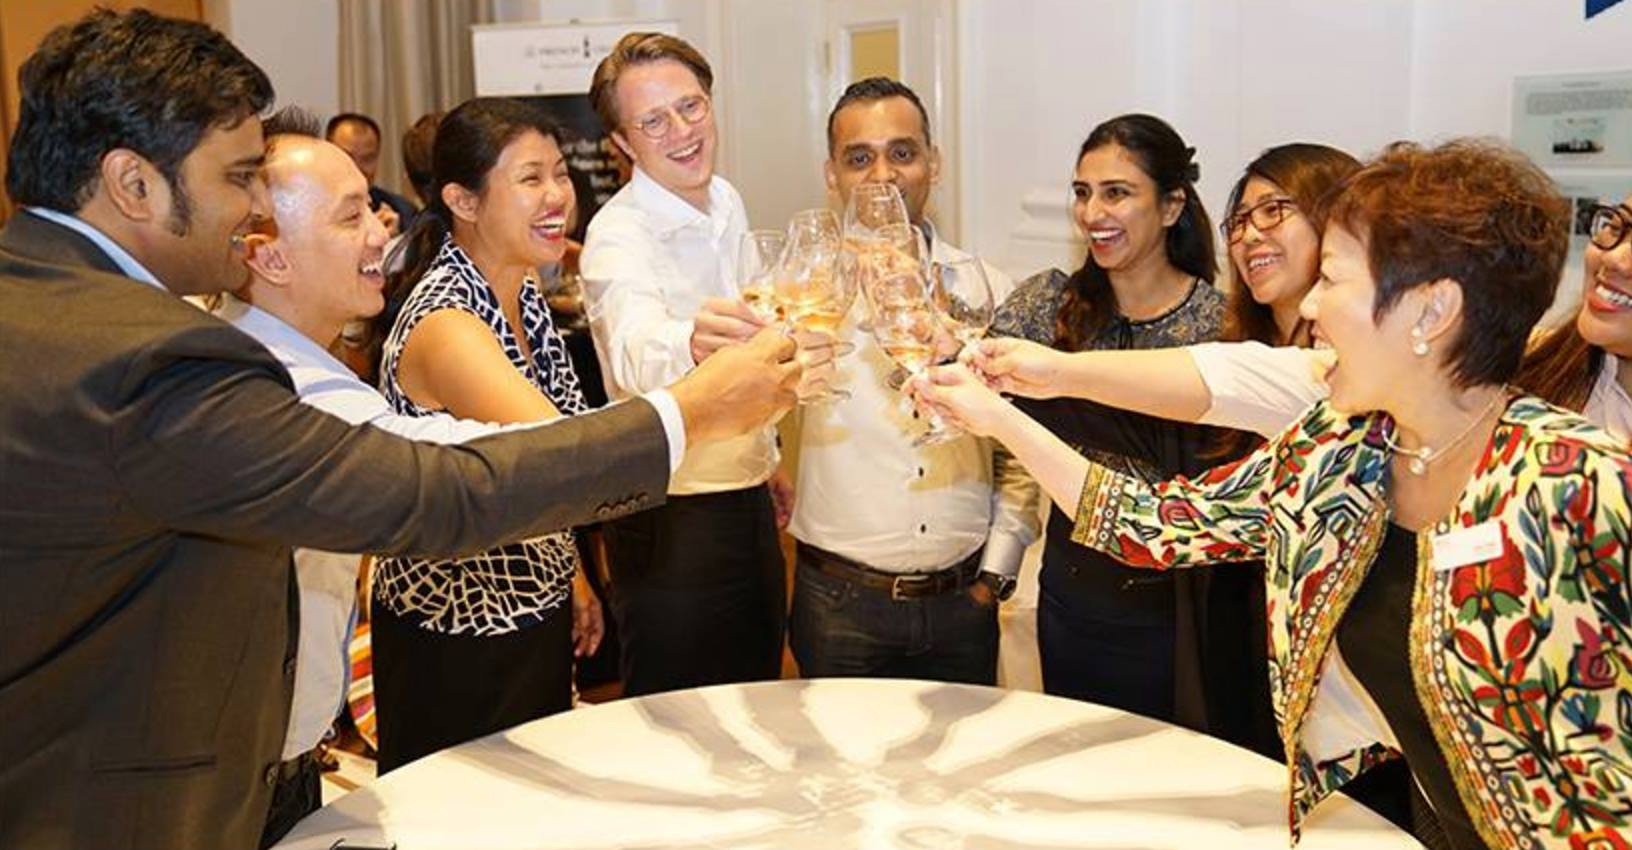 Alumni Wine Tasting event with Nanyang Business School